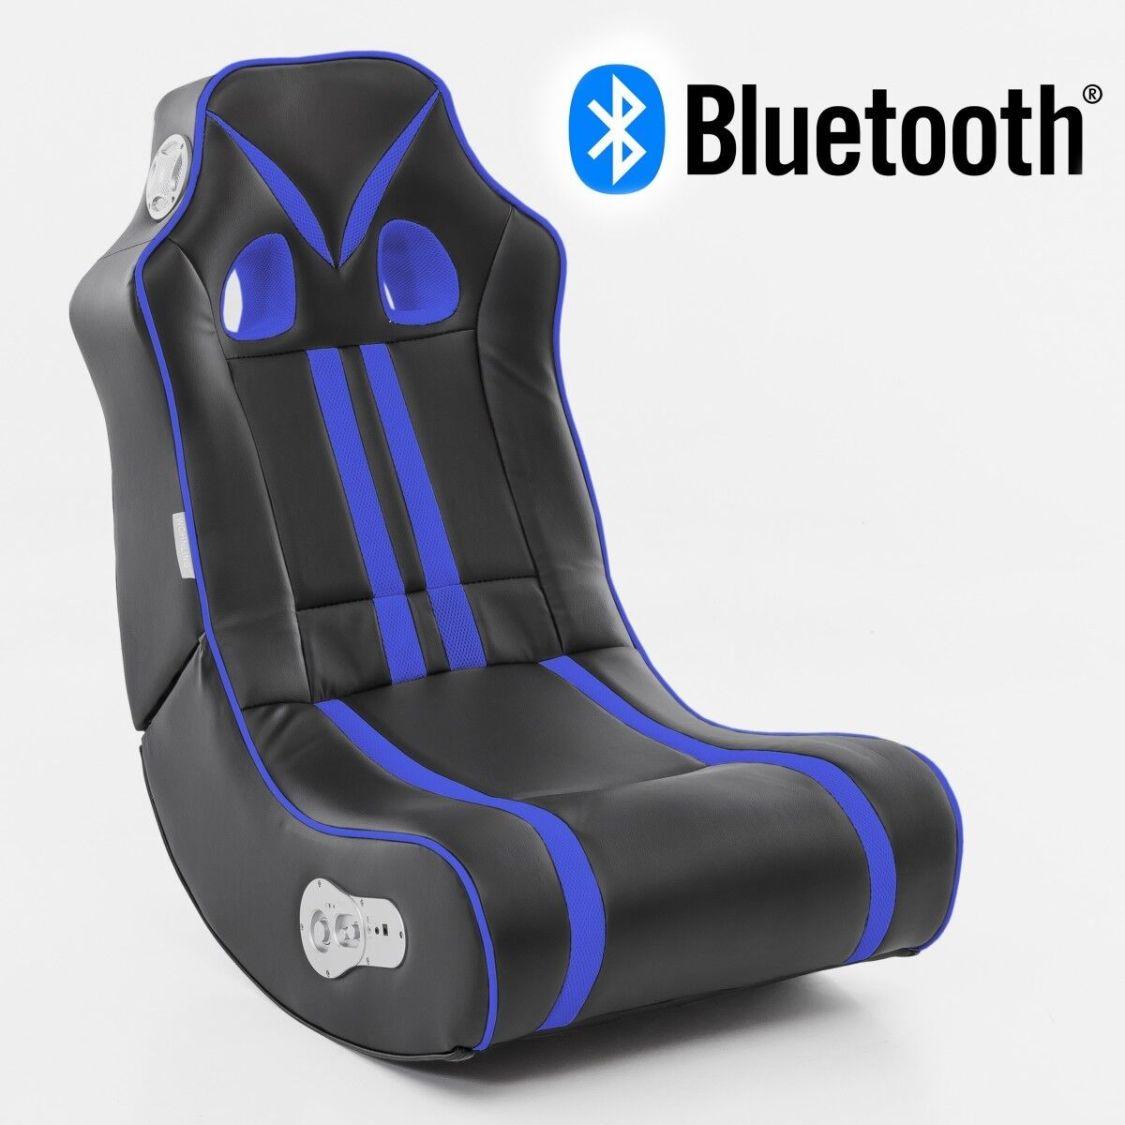 NINJA Soundchair Bluetooth Gaming Chair Gamer Rocker Soundsessel Musiksessel